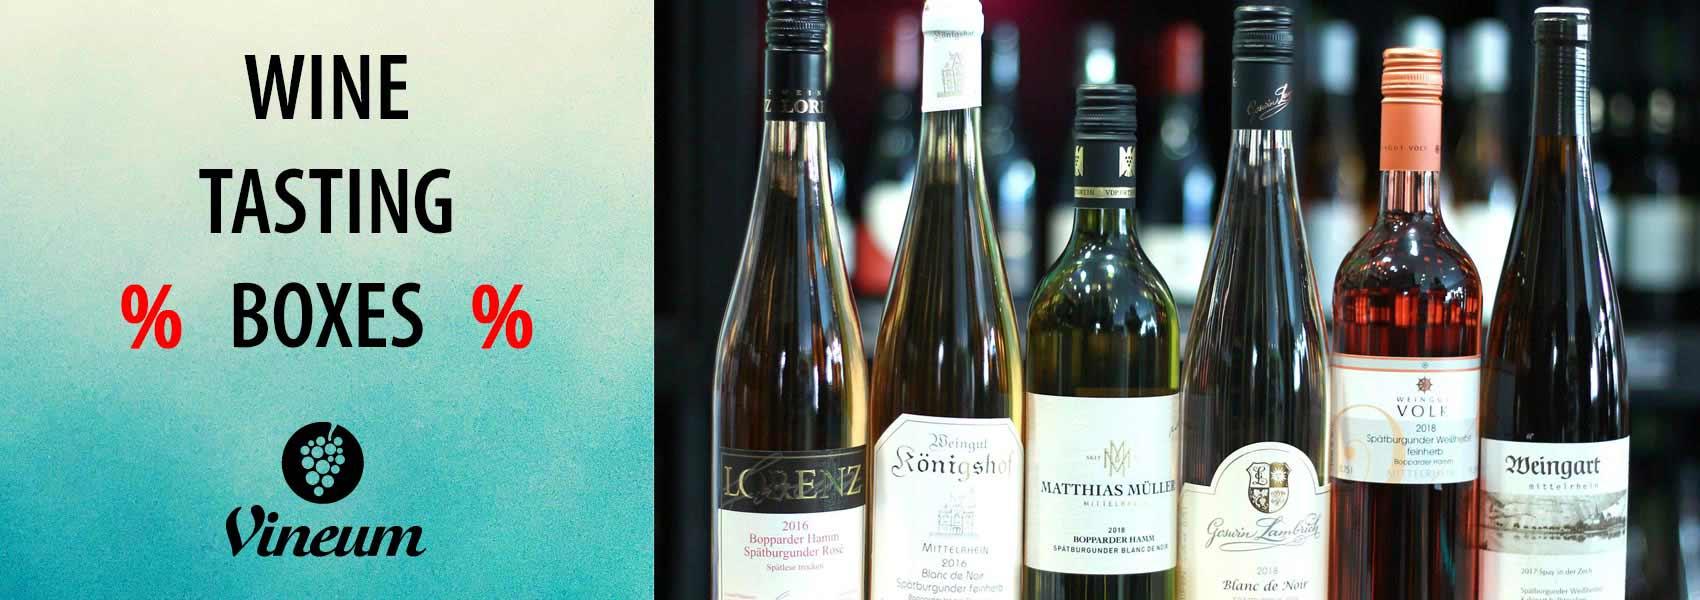 Wine Tasting Boxes Middle Rhine